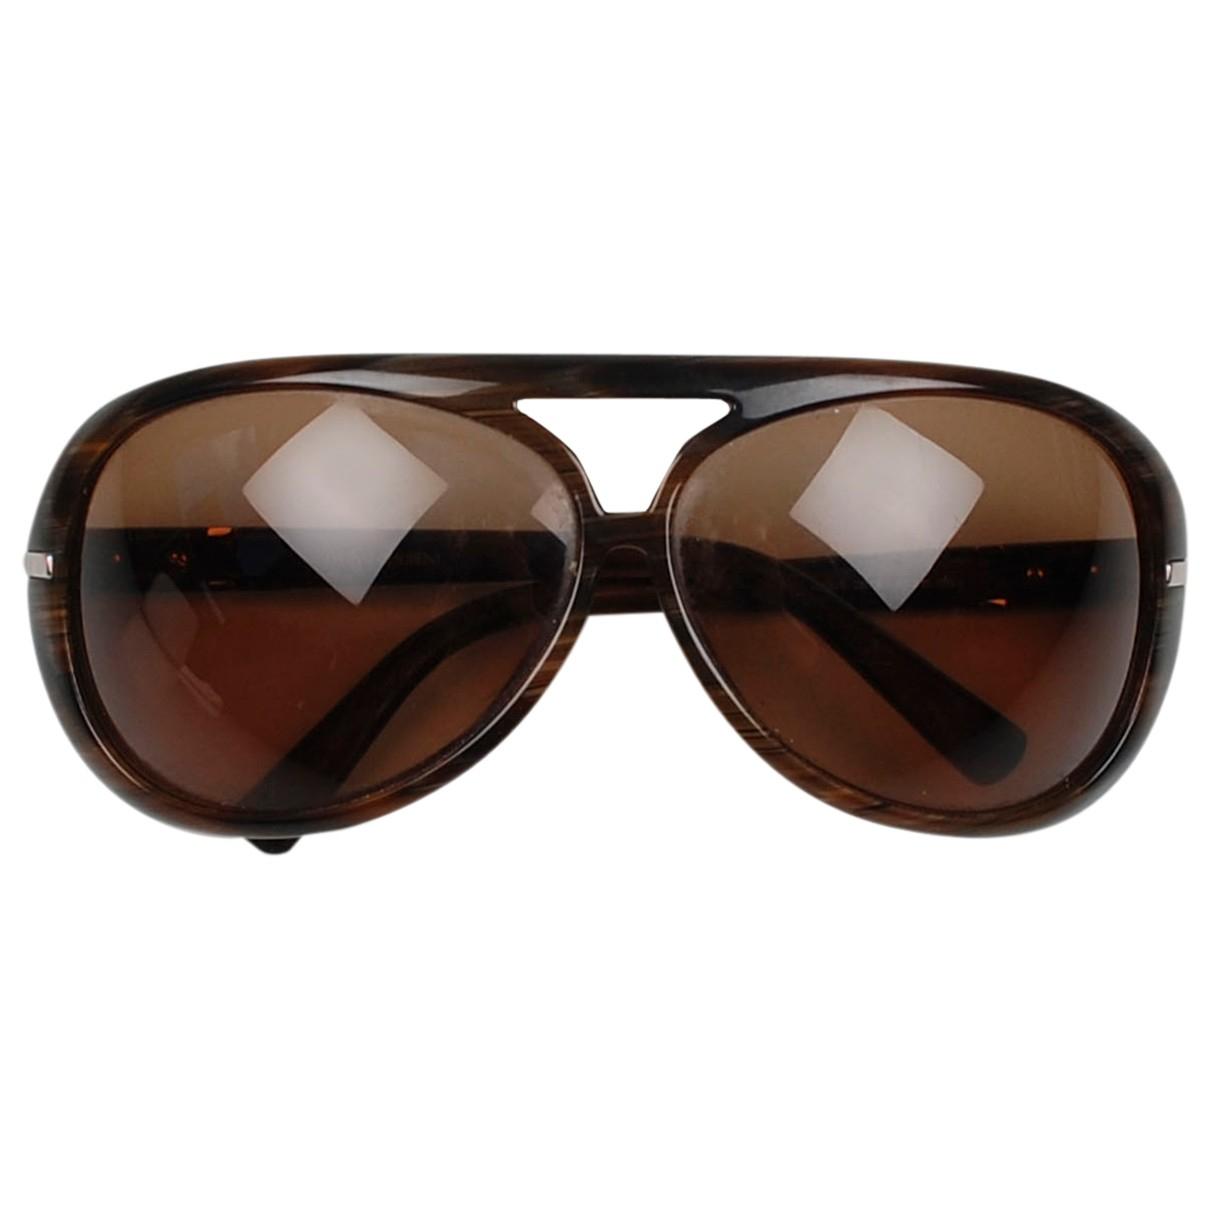 Yves Saint Laurent \N Brown Sunglasses for Men \N